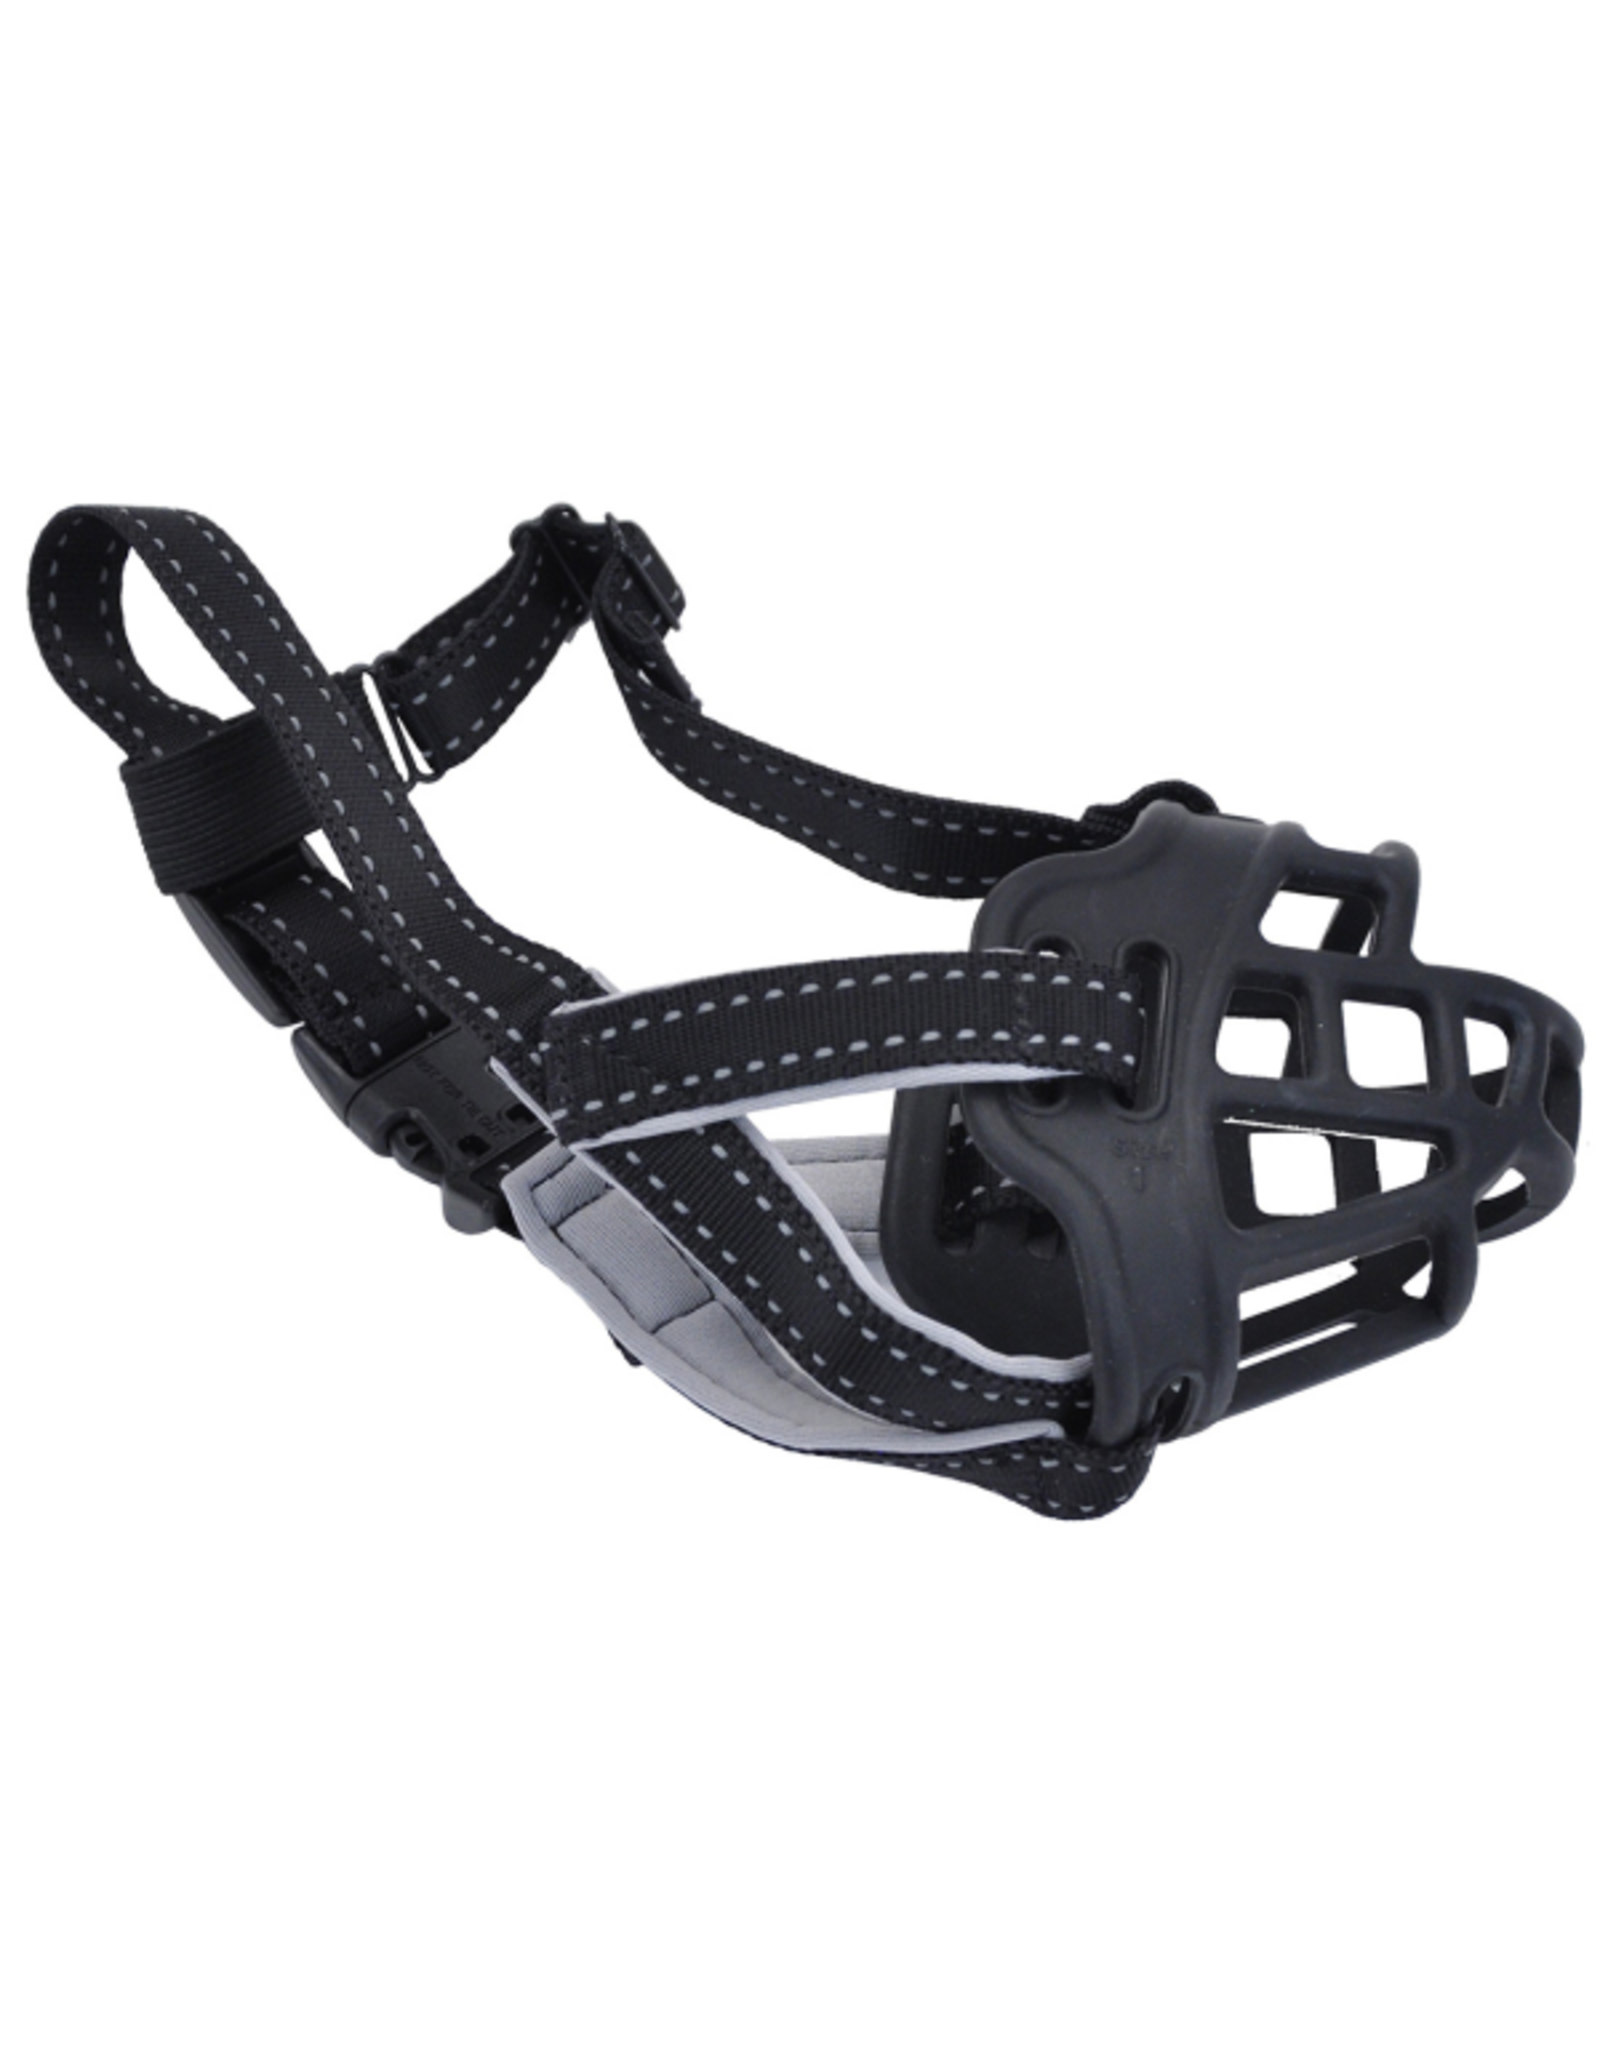 Coastal Pet Products Soft Basket Muzzle - Black